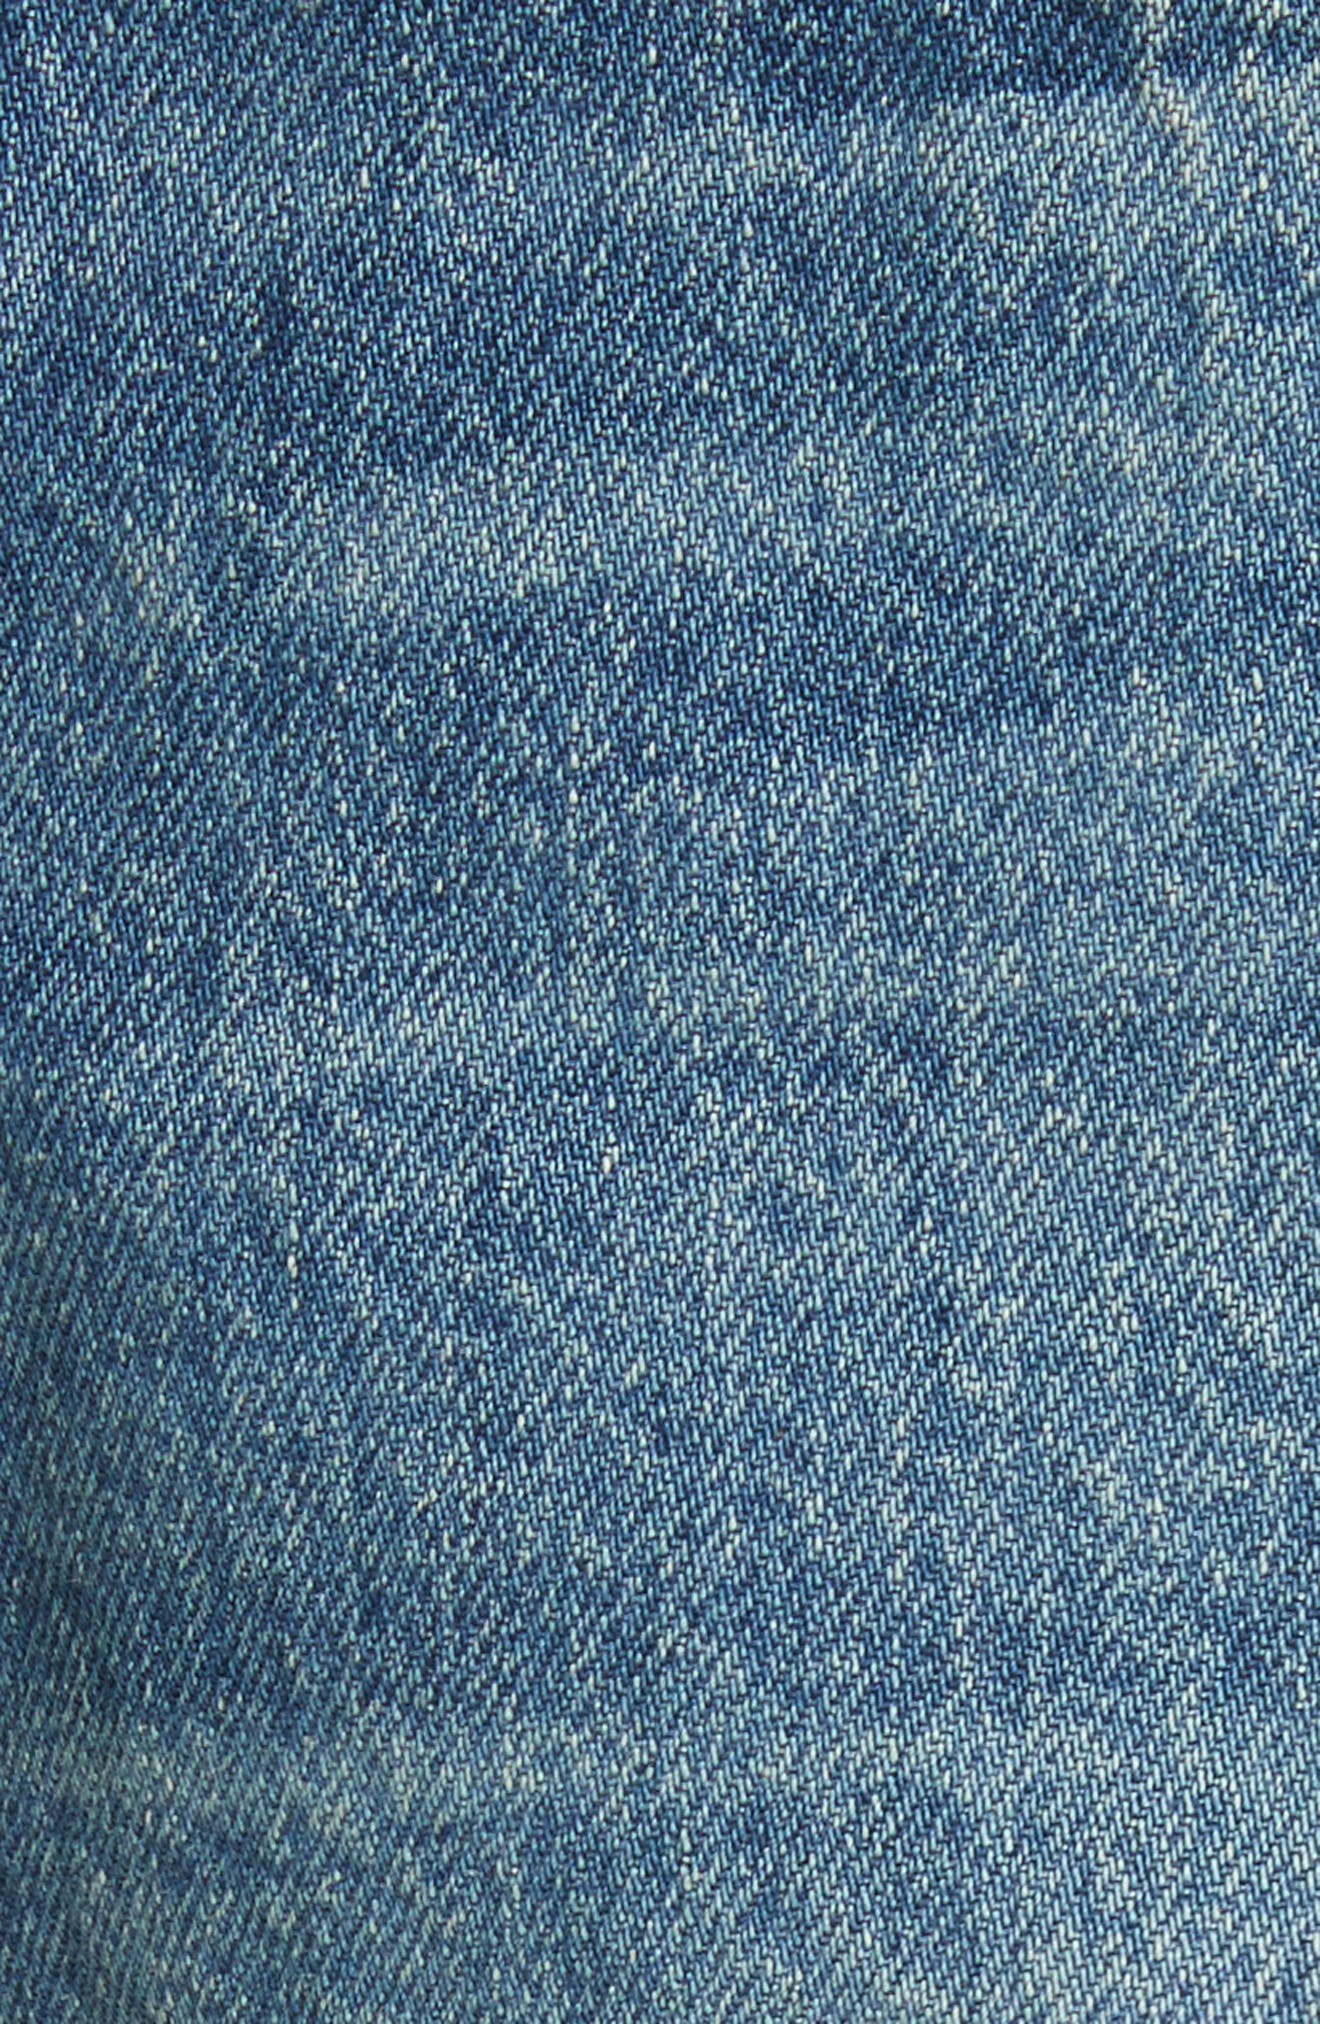 W4 Carter Ripped High Waist Denim Shorts,                             Alternate thumbnail 5, color,                             422